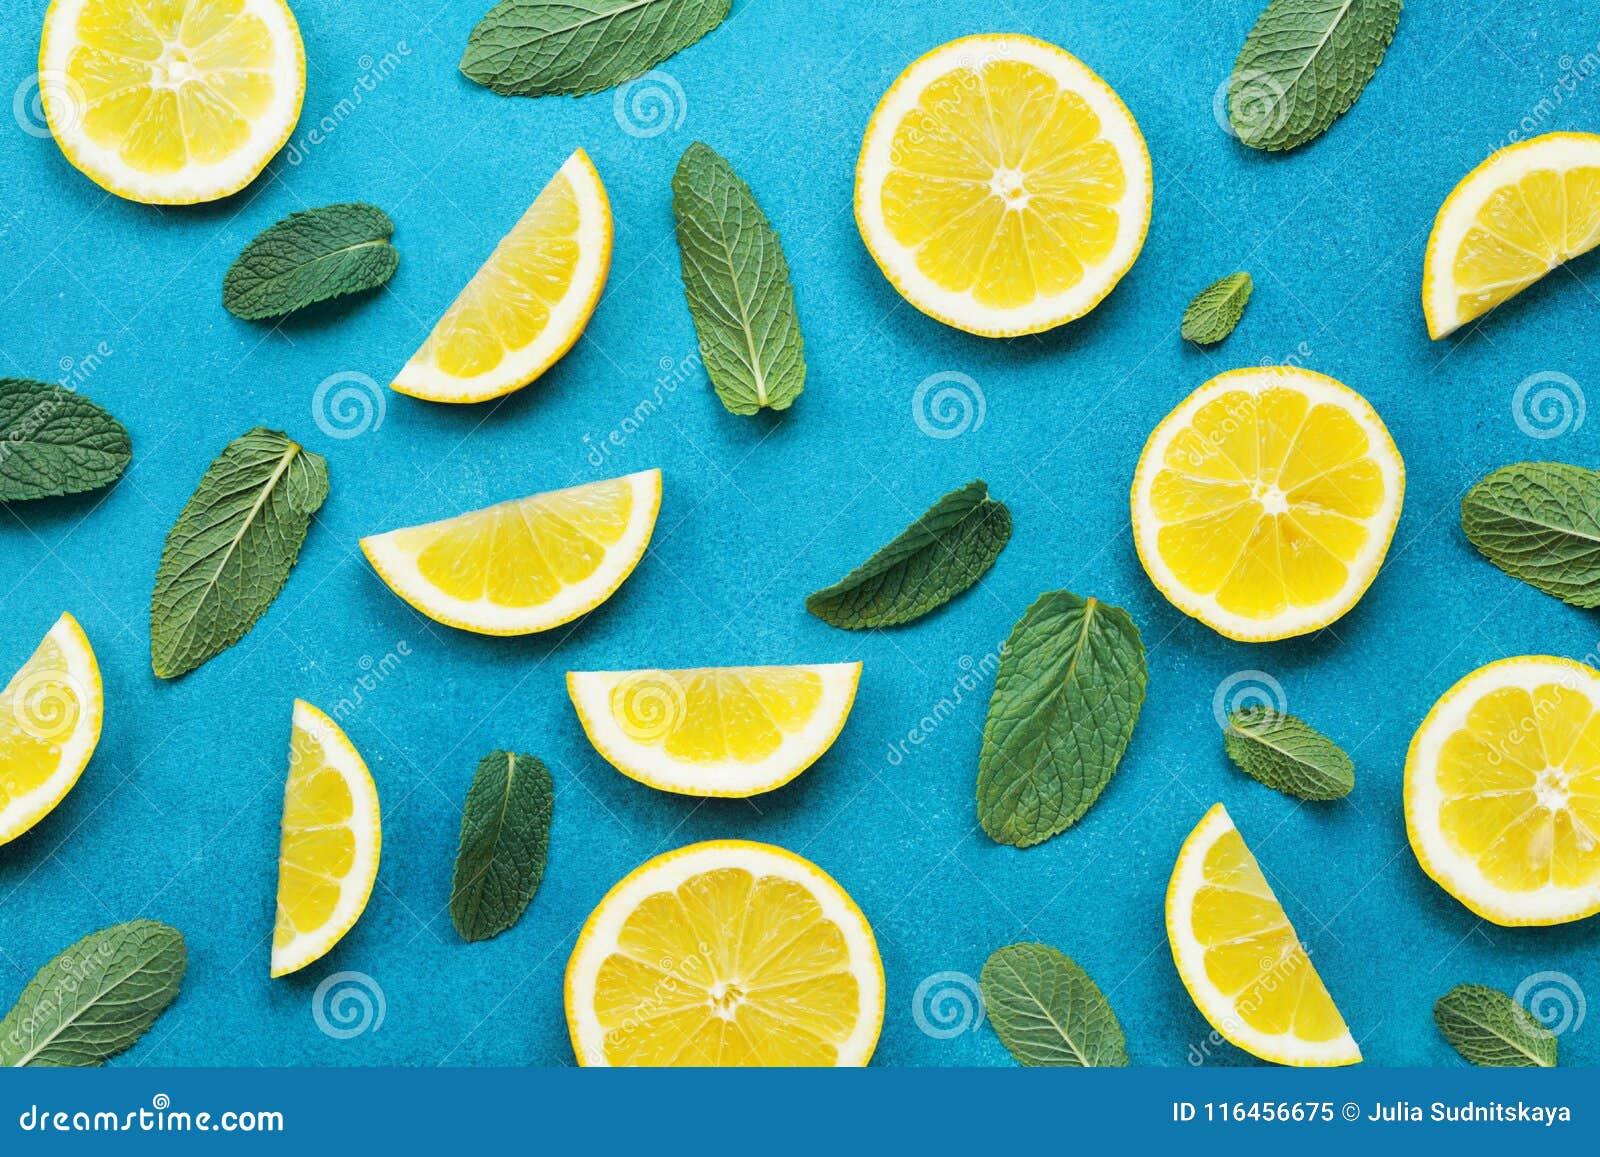 Punchy υπόβαθρο κρητιδογραφιών με τις φέτες λεμονιών και τα φύλλα μεντών Θερινό ζωηρόχρωμο σχέδιο επίπεδος βάλτε το ύφος